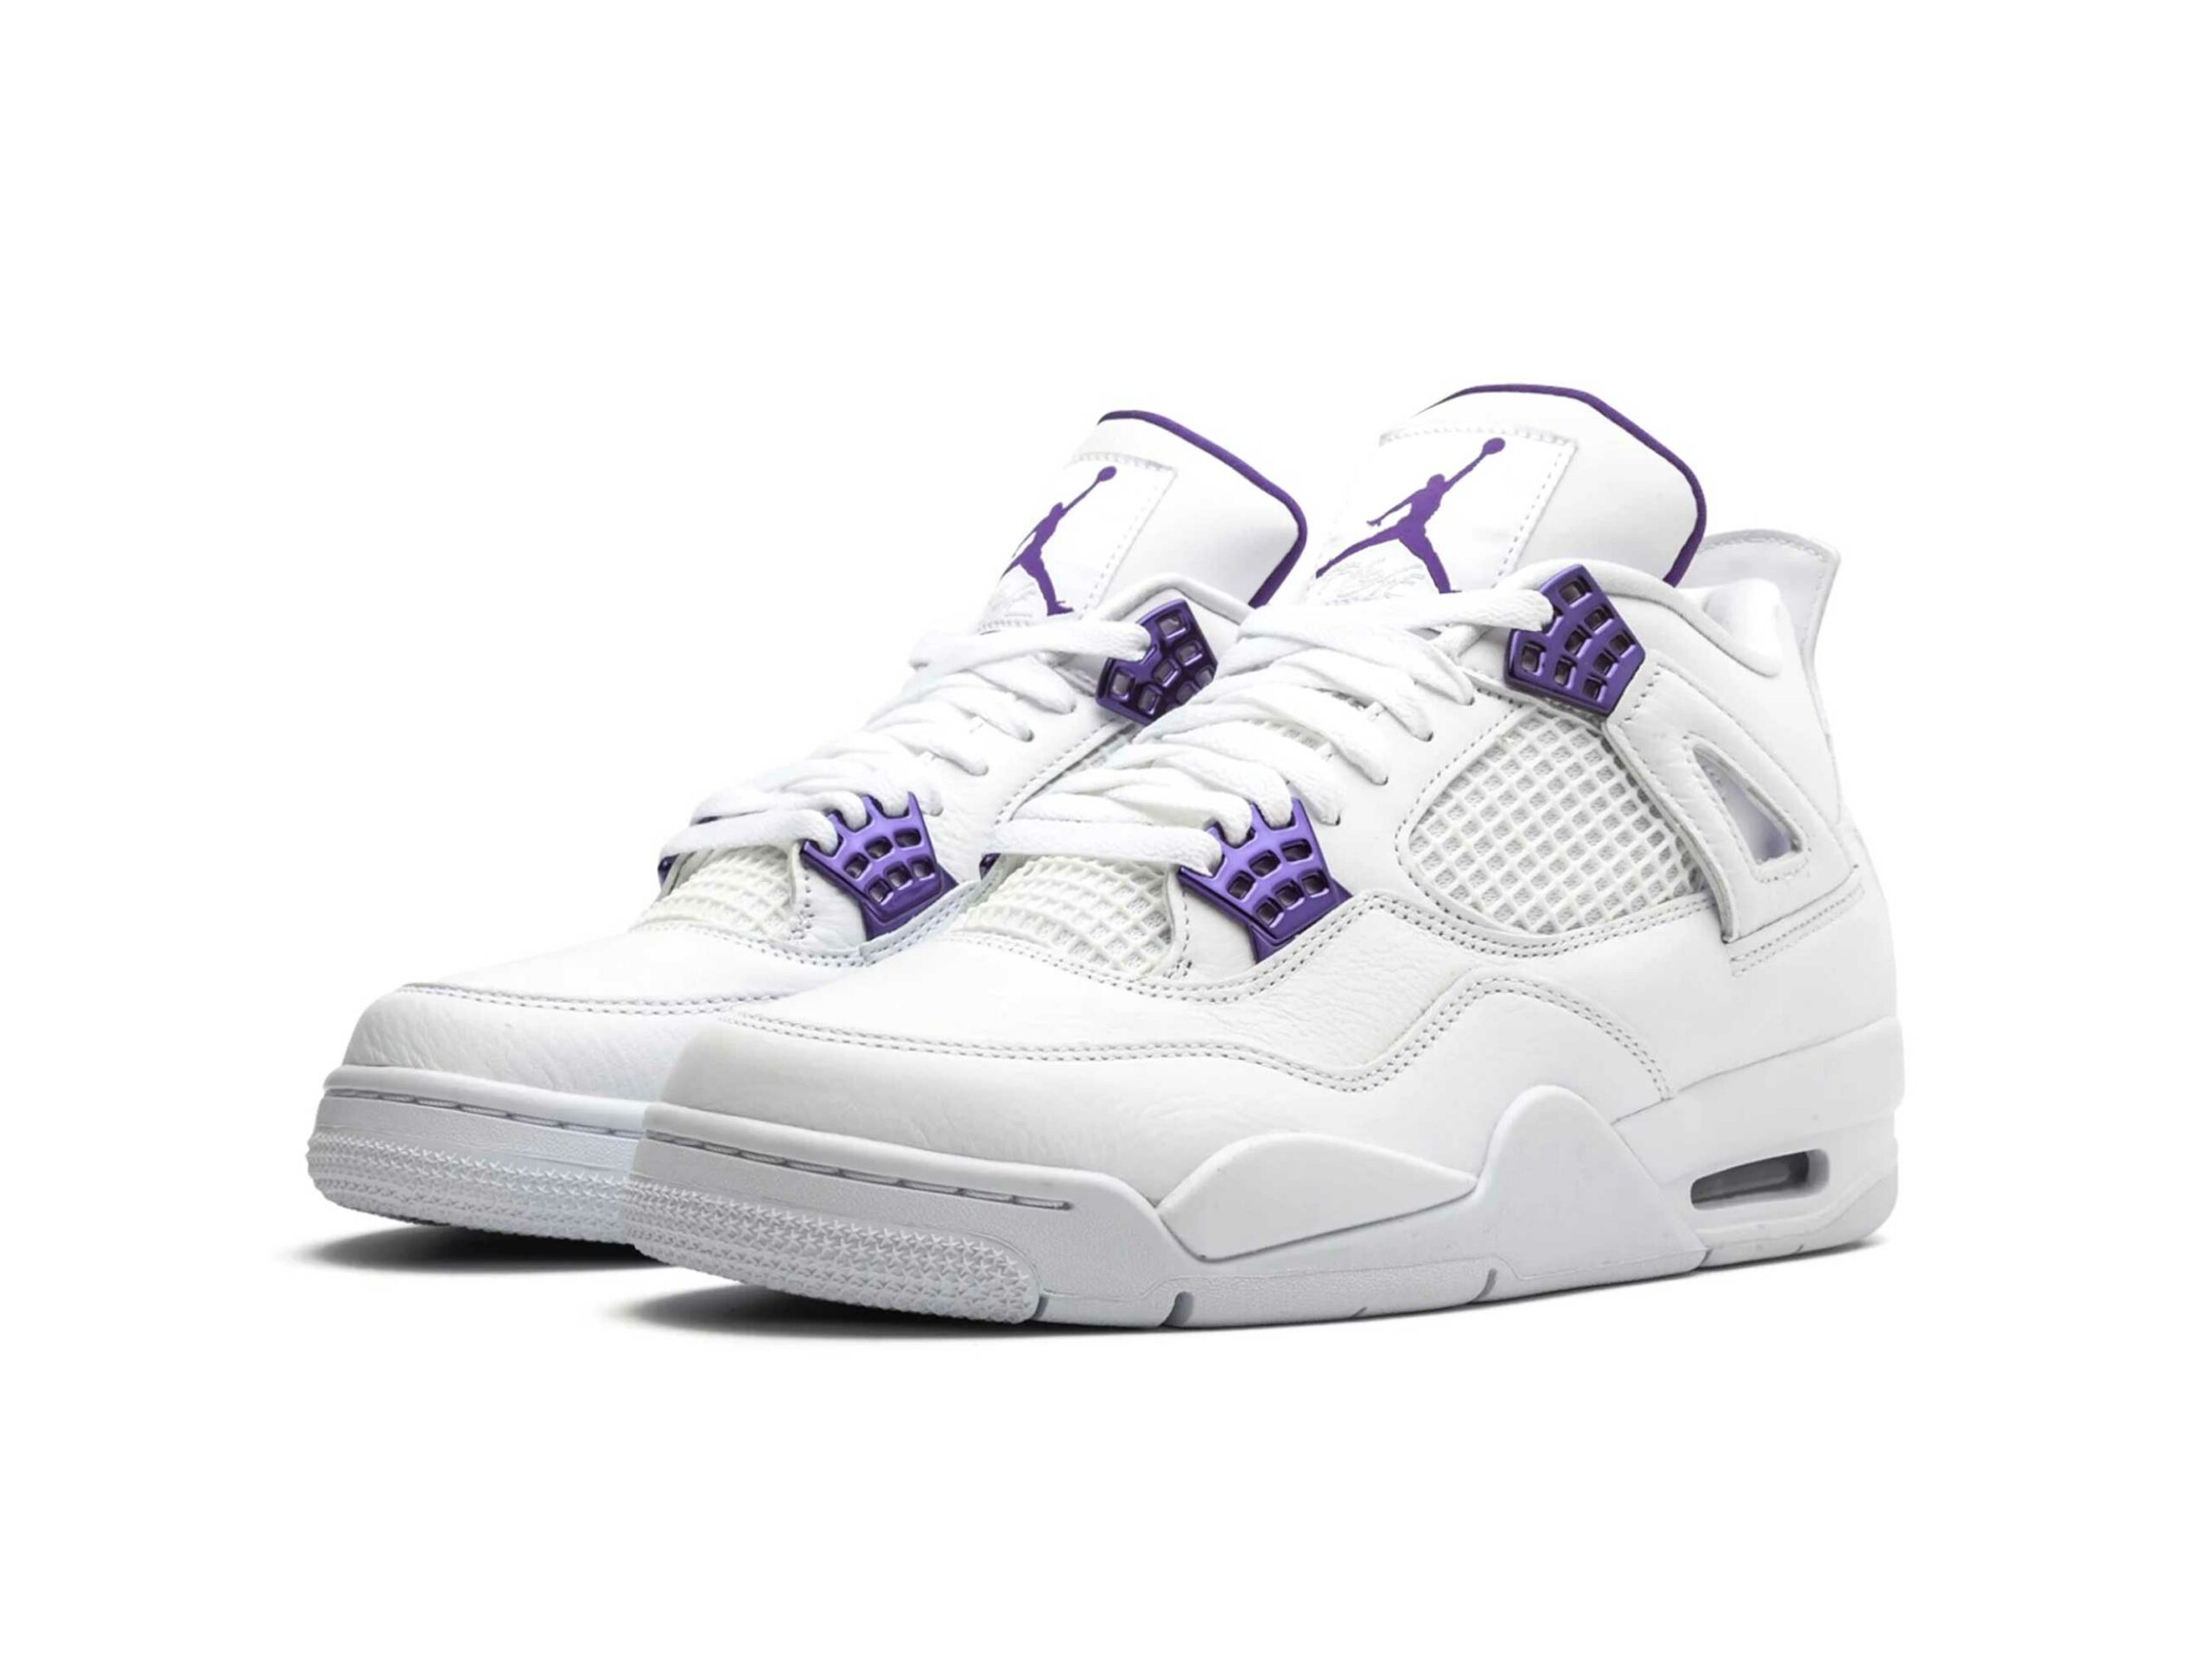 nike air Jordan 4 retro metallic pack purple CT8527_115 купить